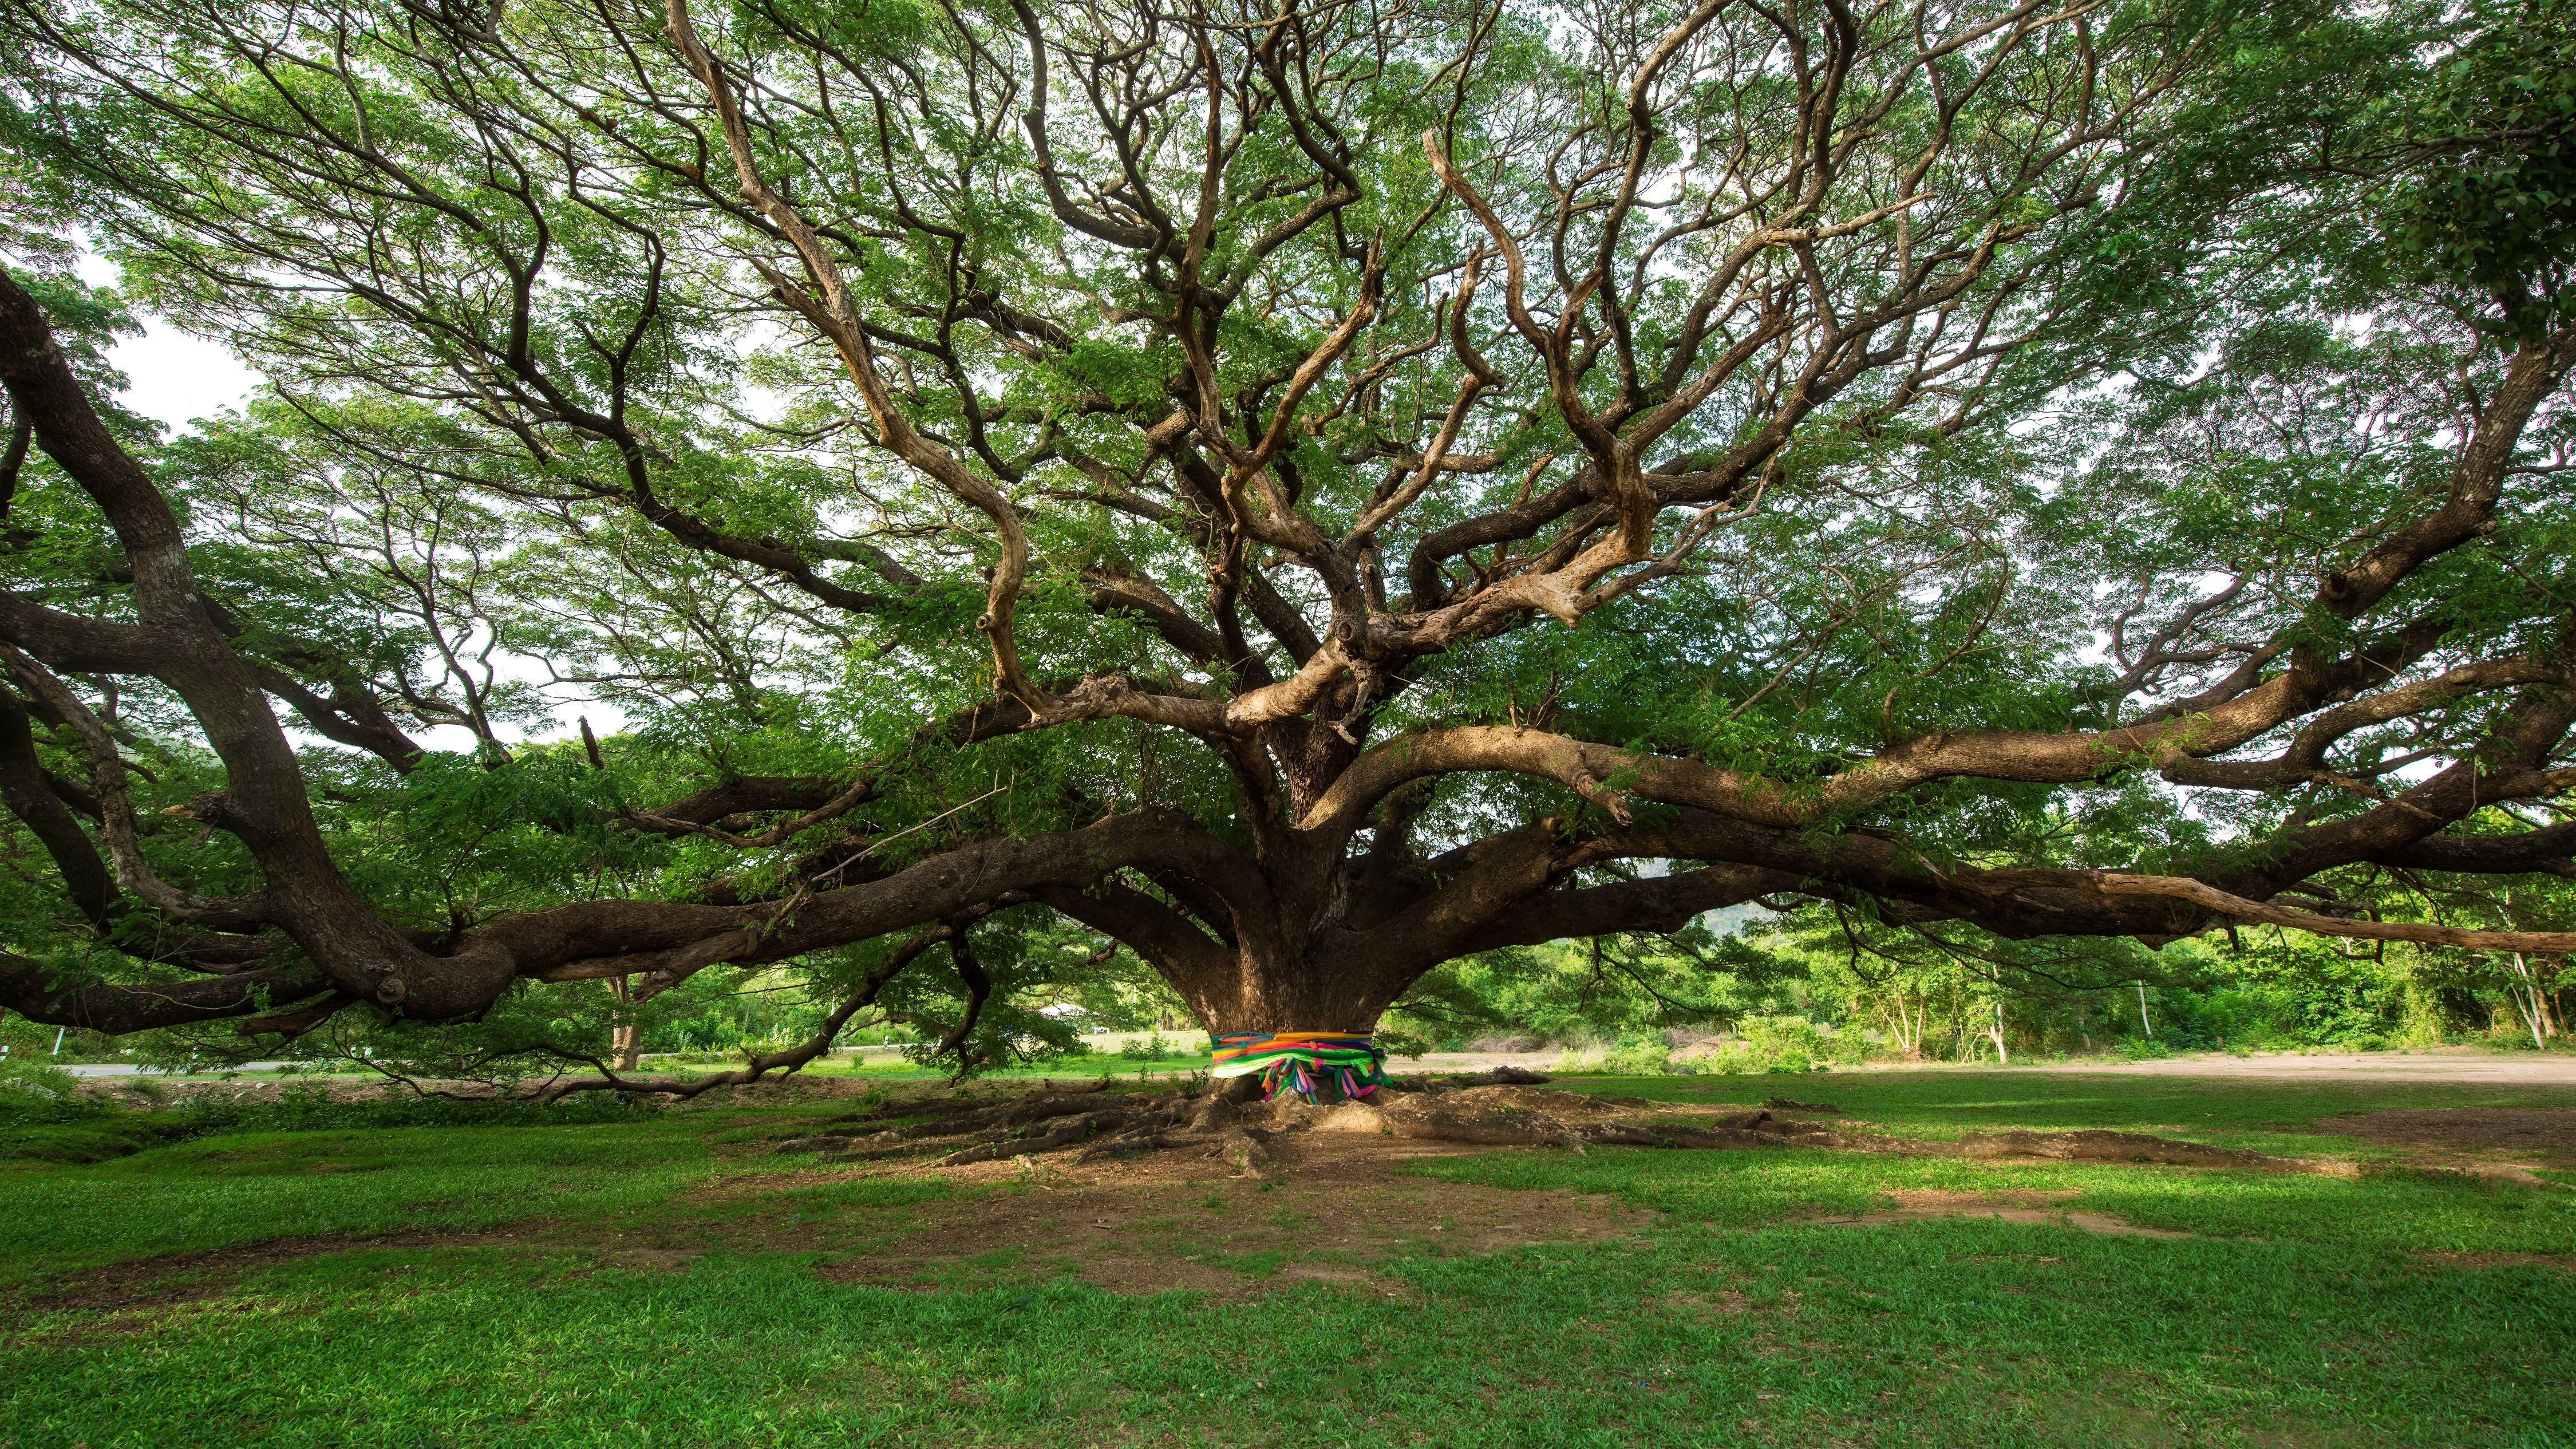 Giant rain tree near Kanchanaburi